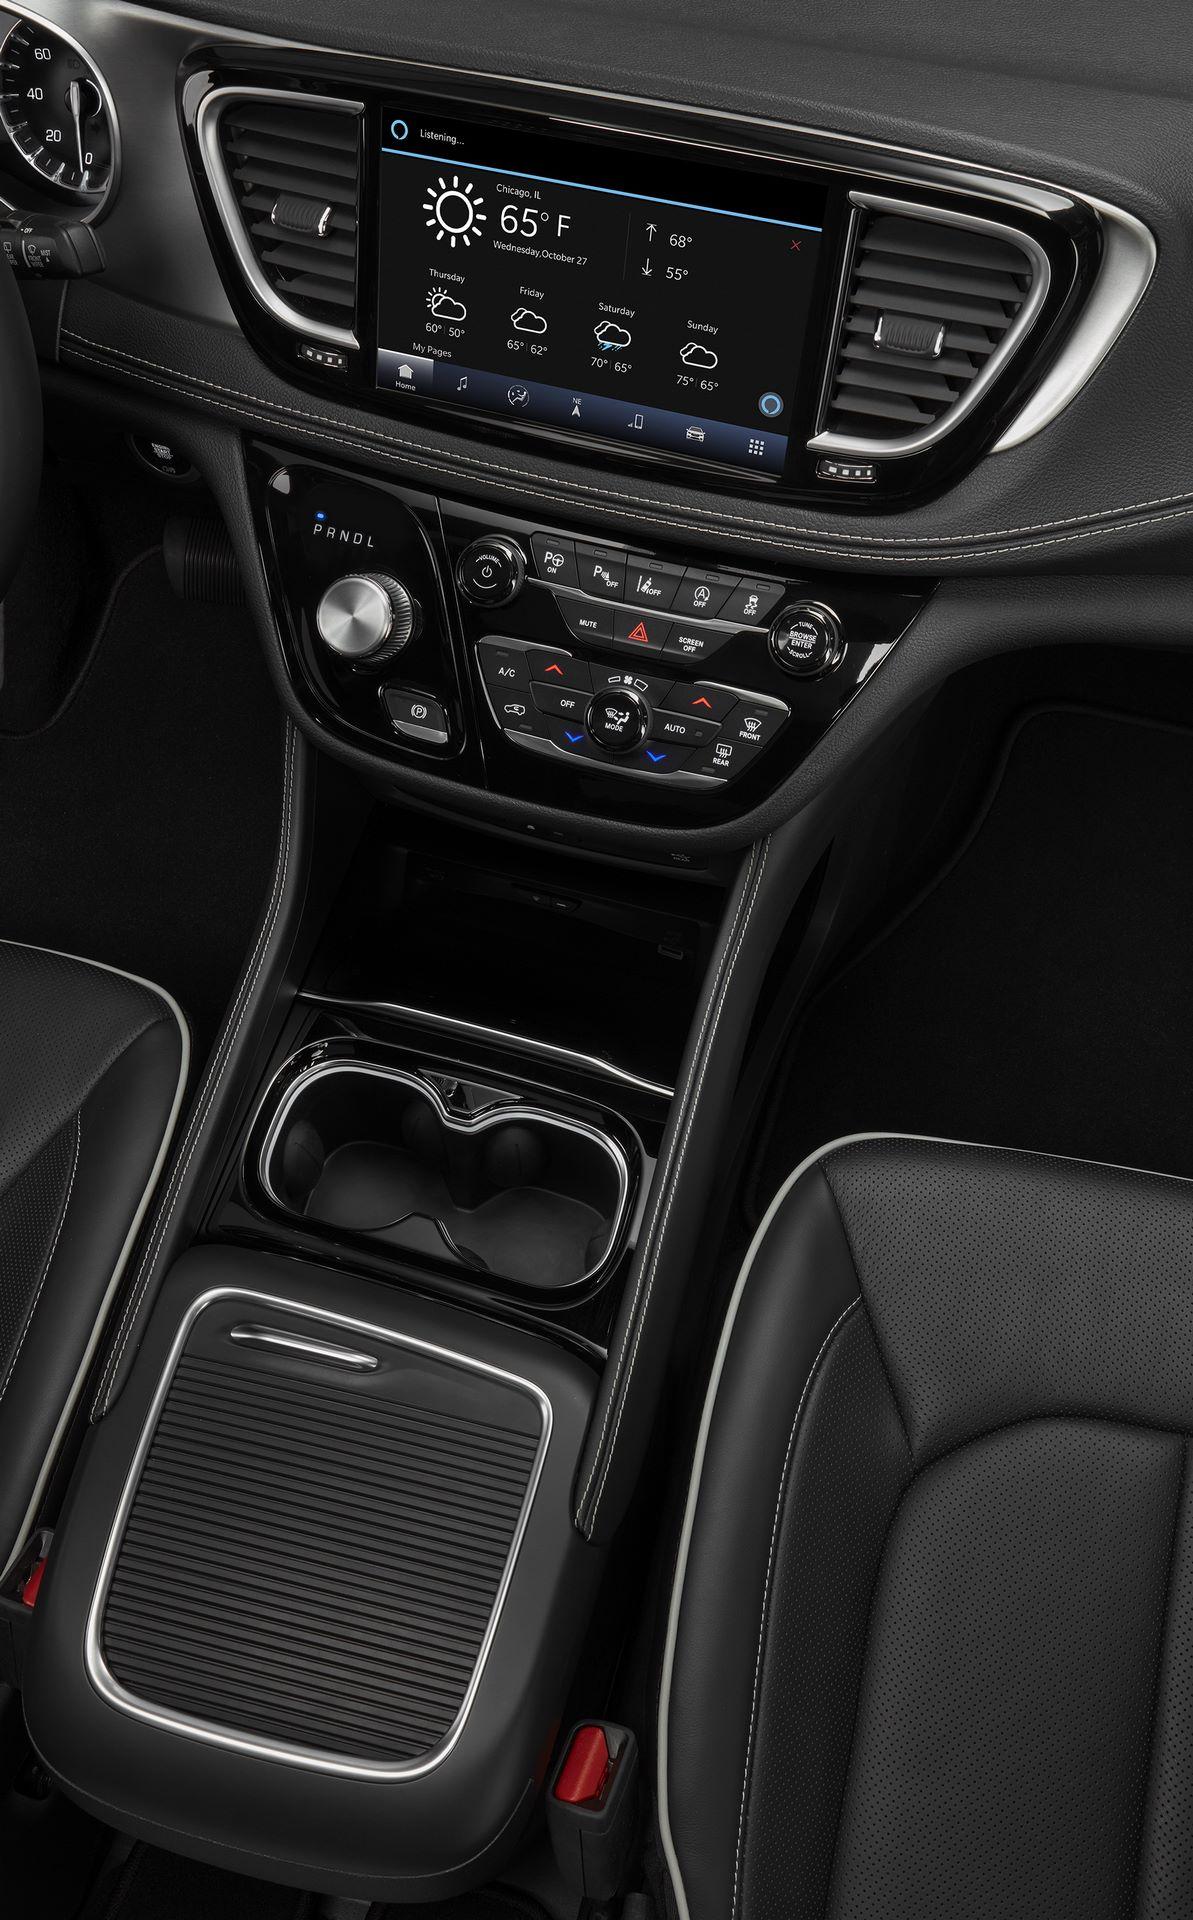 2021-Chrysler-Pacifica-139